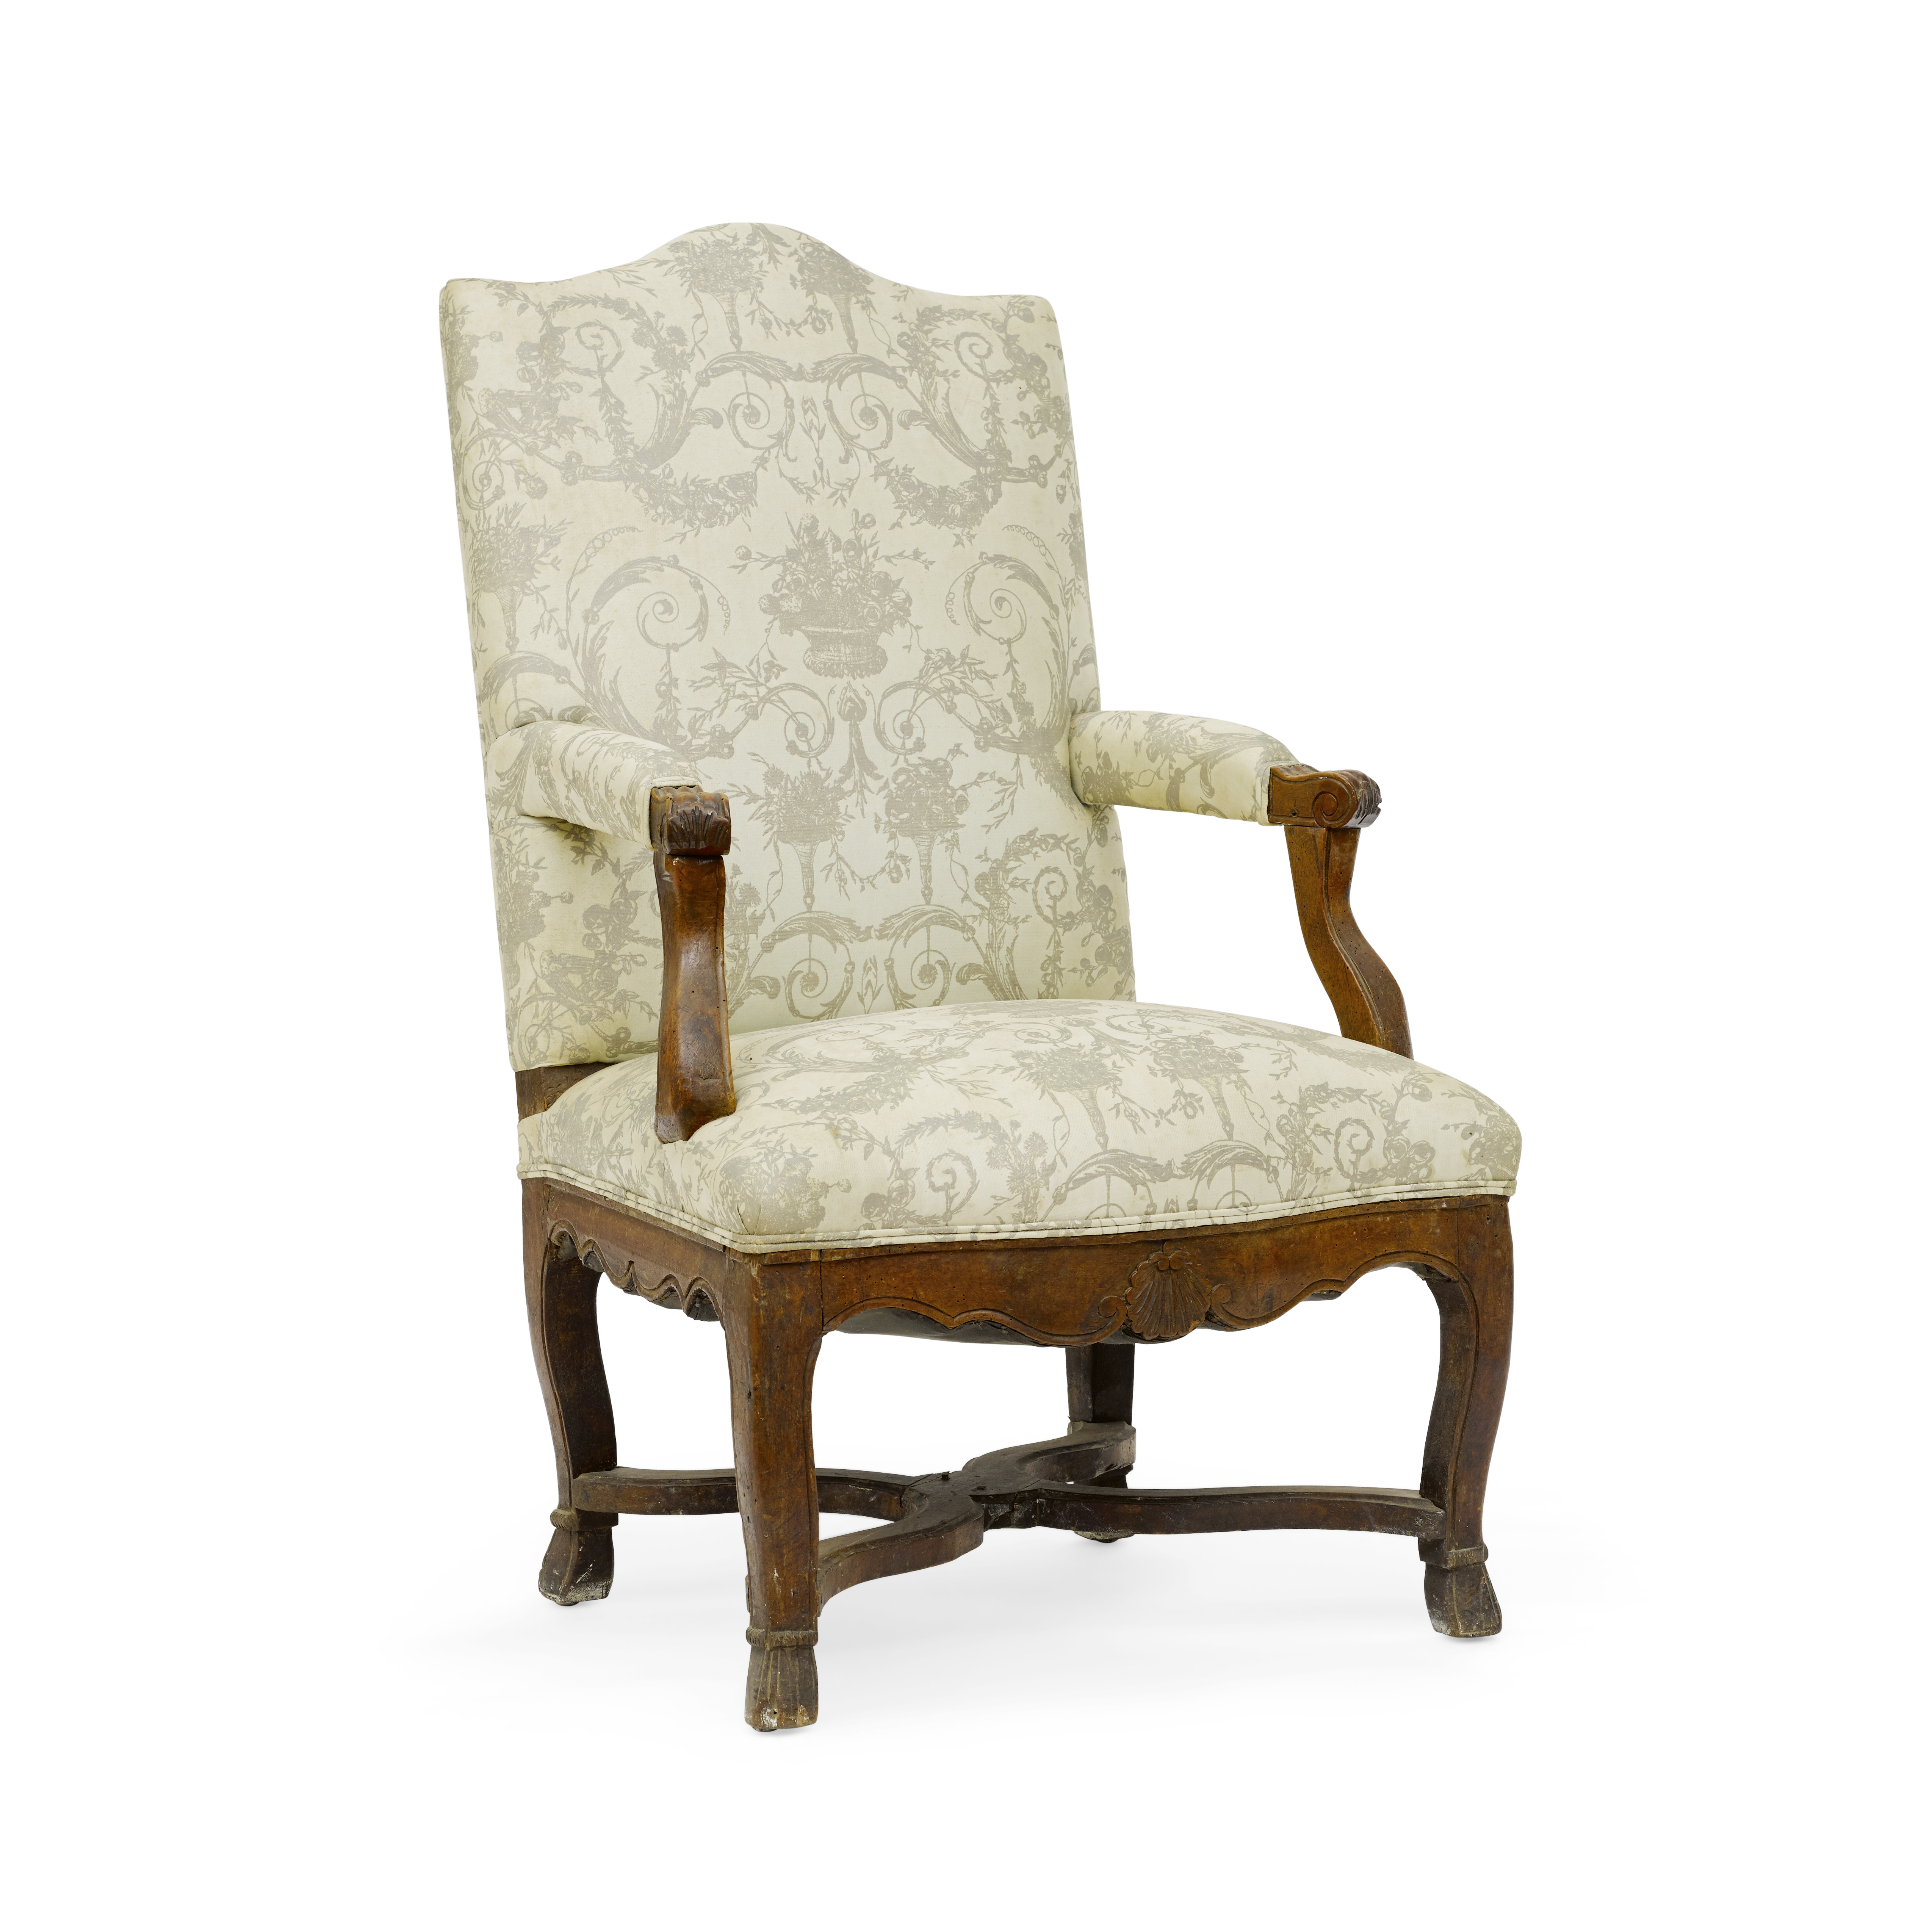 Lot 155 - A Louis XV walnut fauteuil a la reine First quarter 18th century